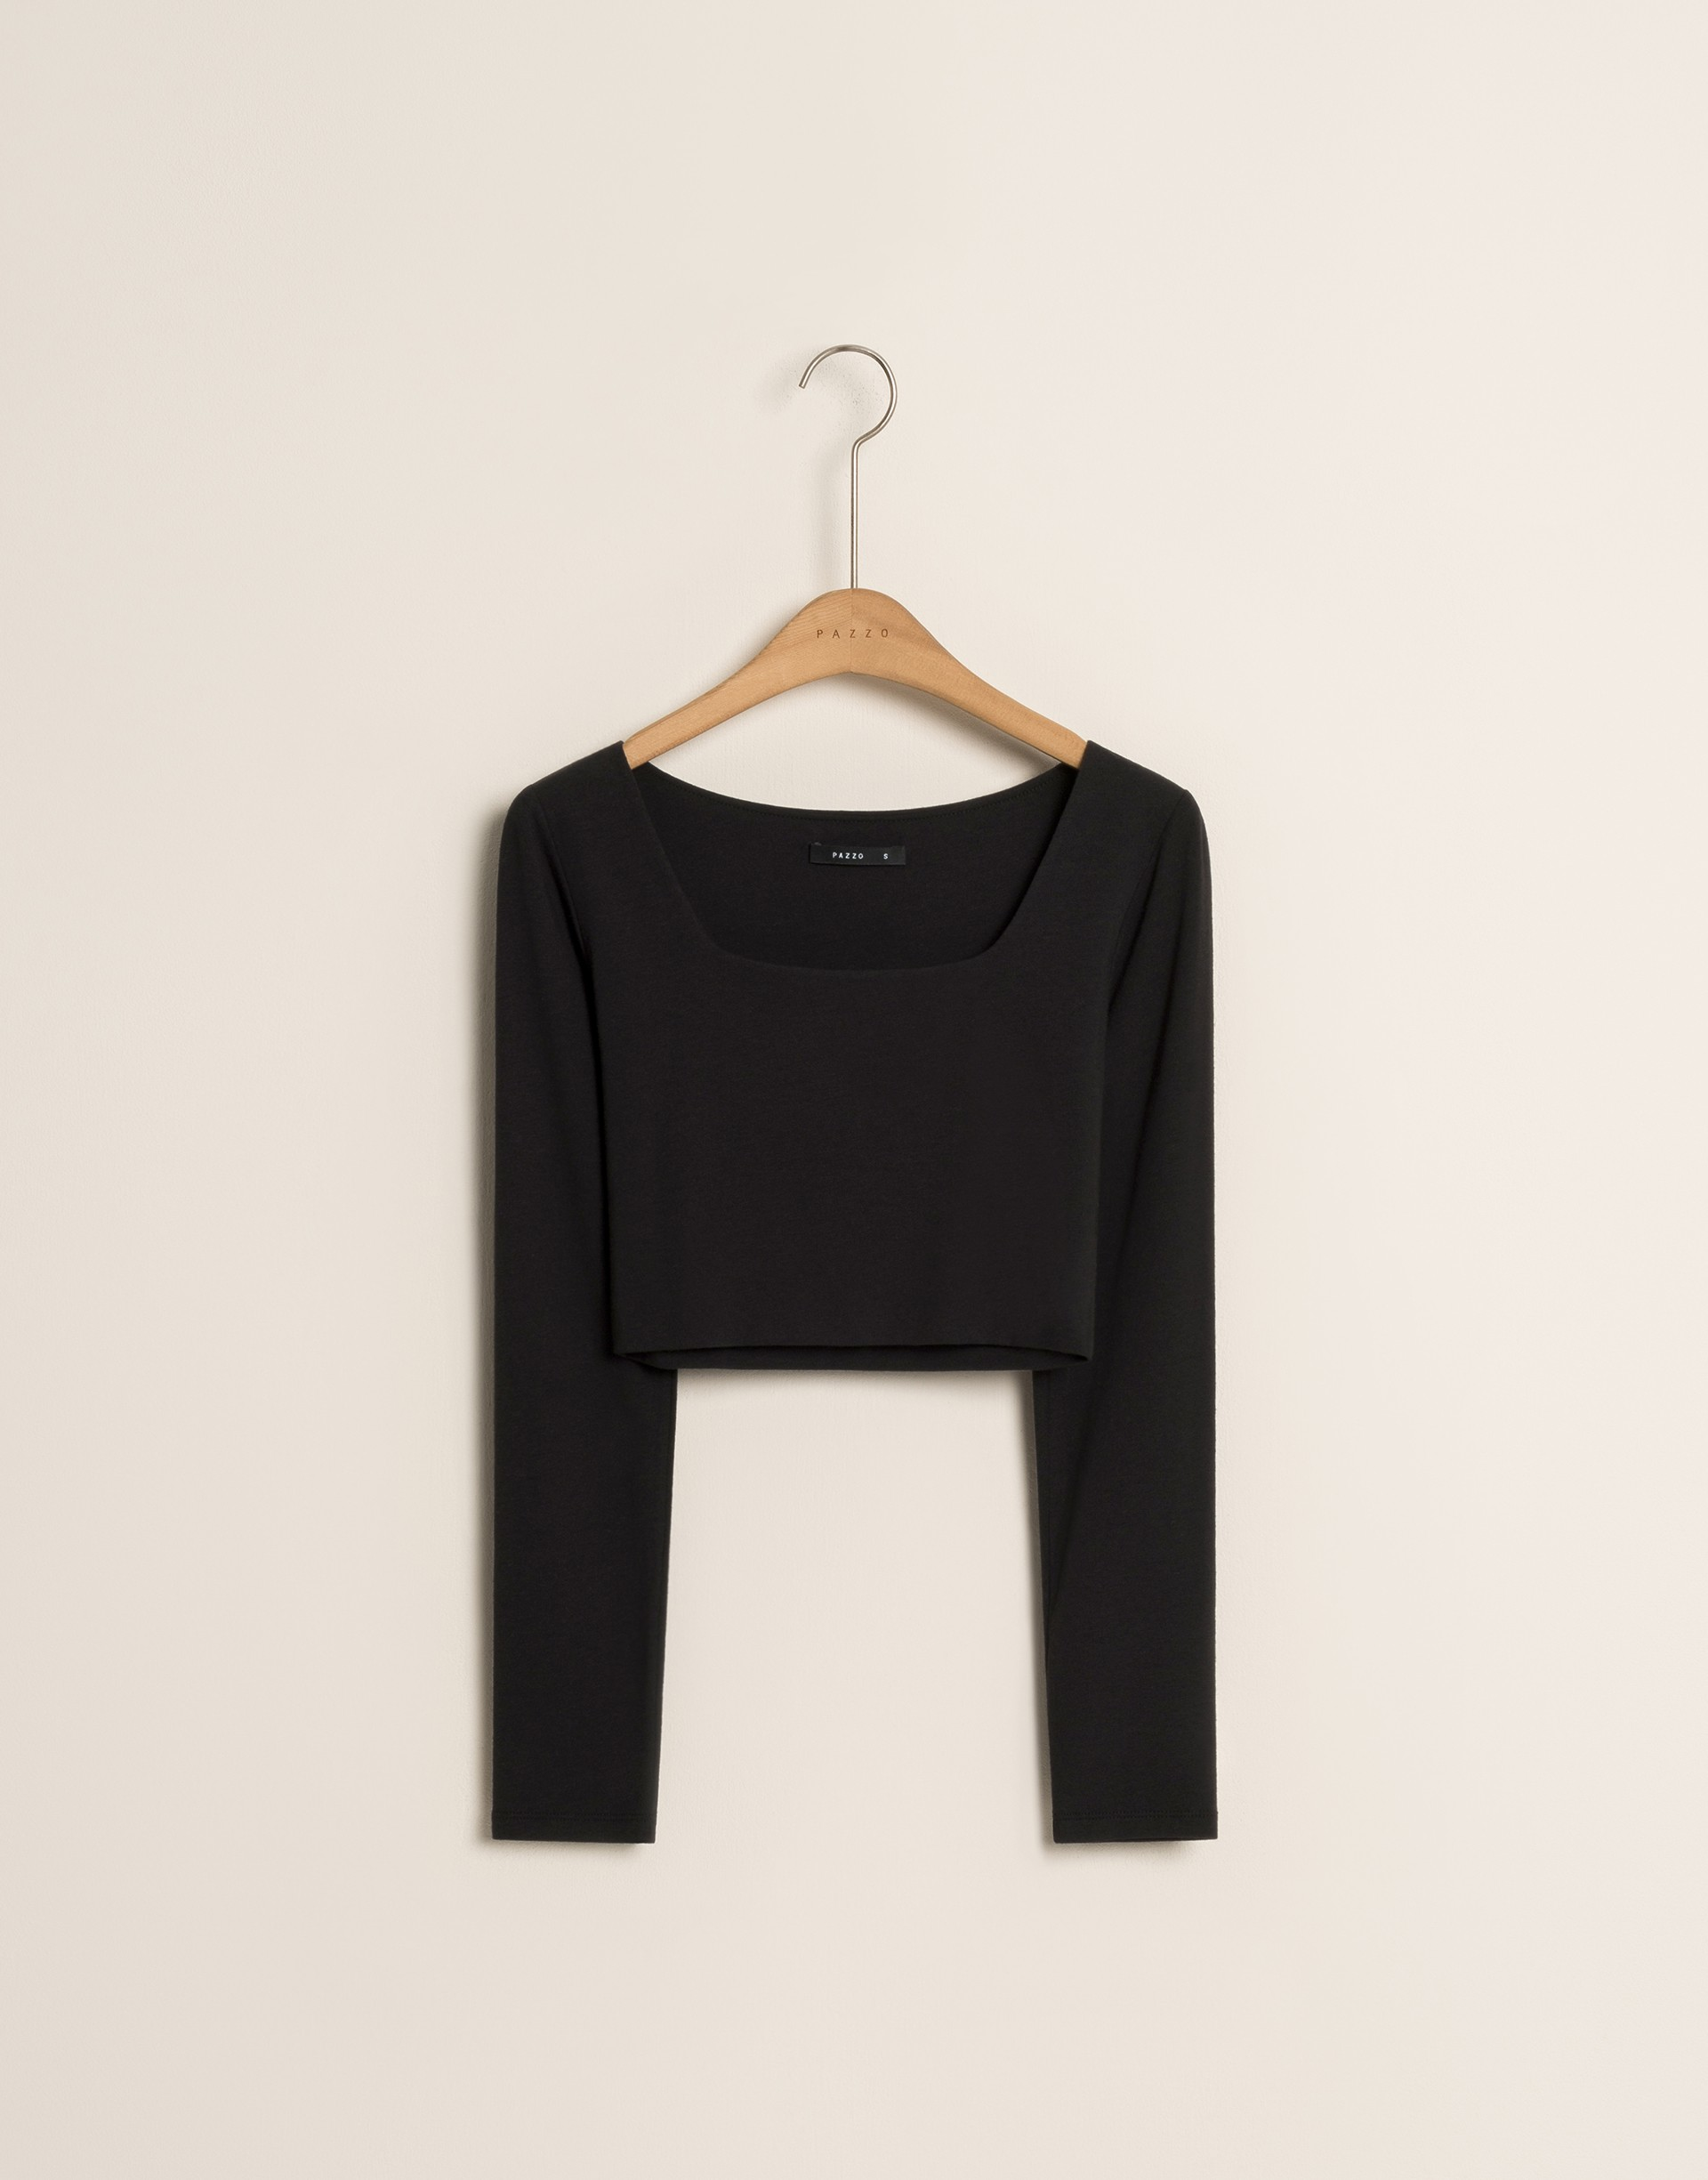 PAZZO+MIT 舒適日常方領造型短版上衣